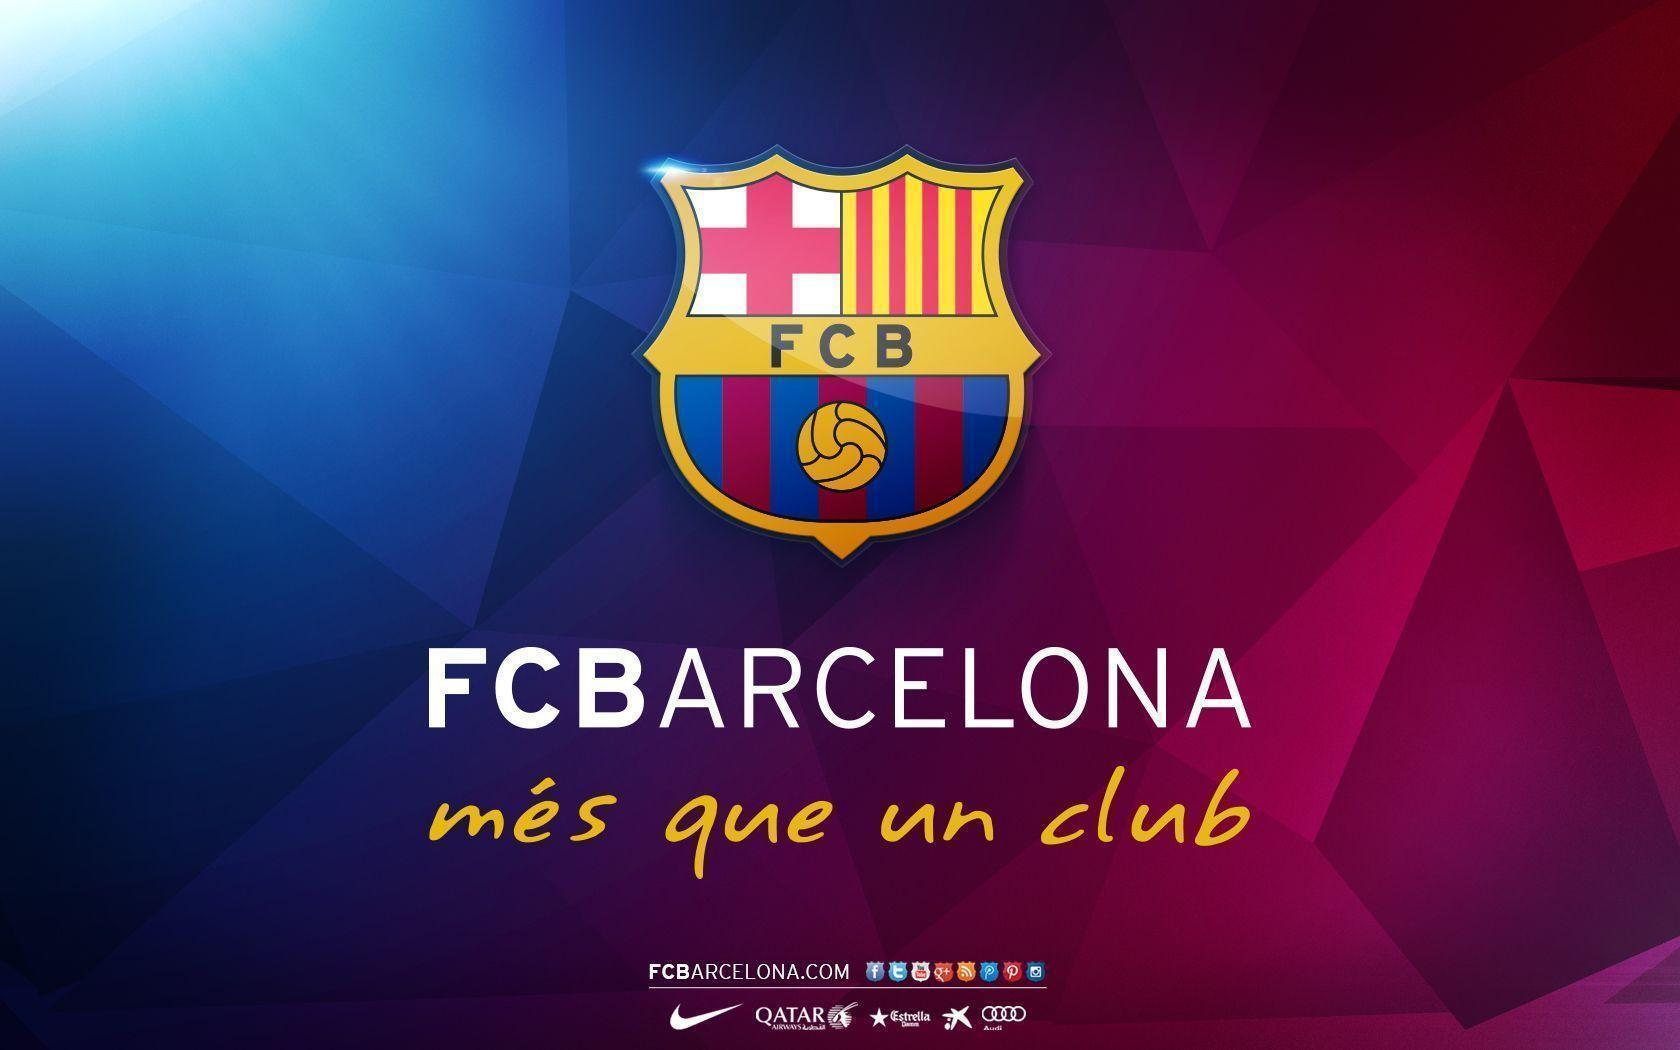 Football Barcelona Wallpaper Computer 35 #1176 Wallpaper | Cool ...